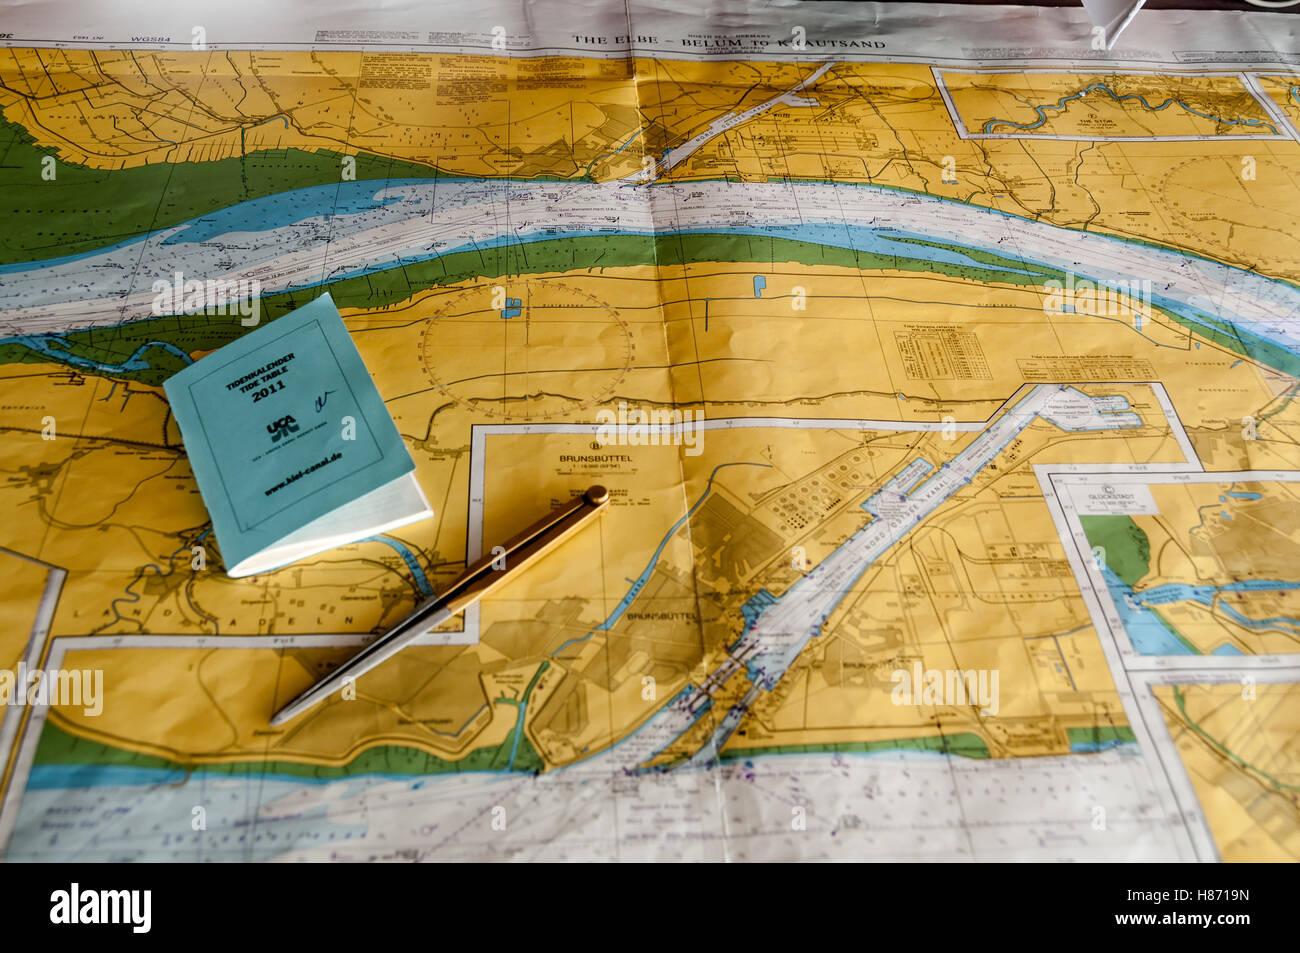 Navigation through Kiel Canal, Germany - Stock Image